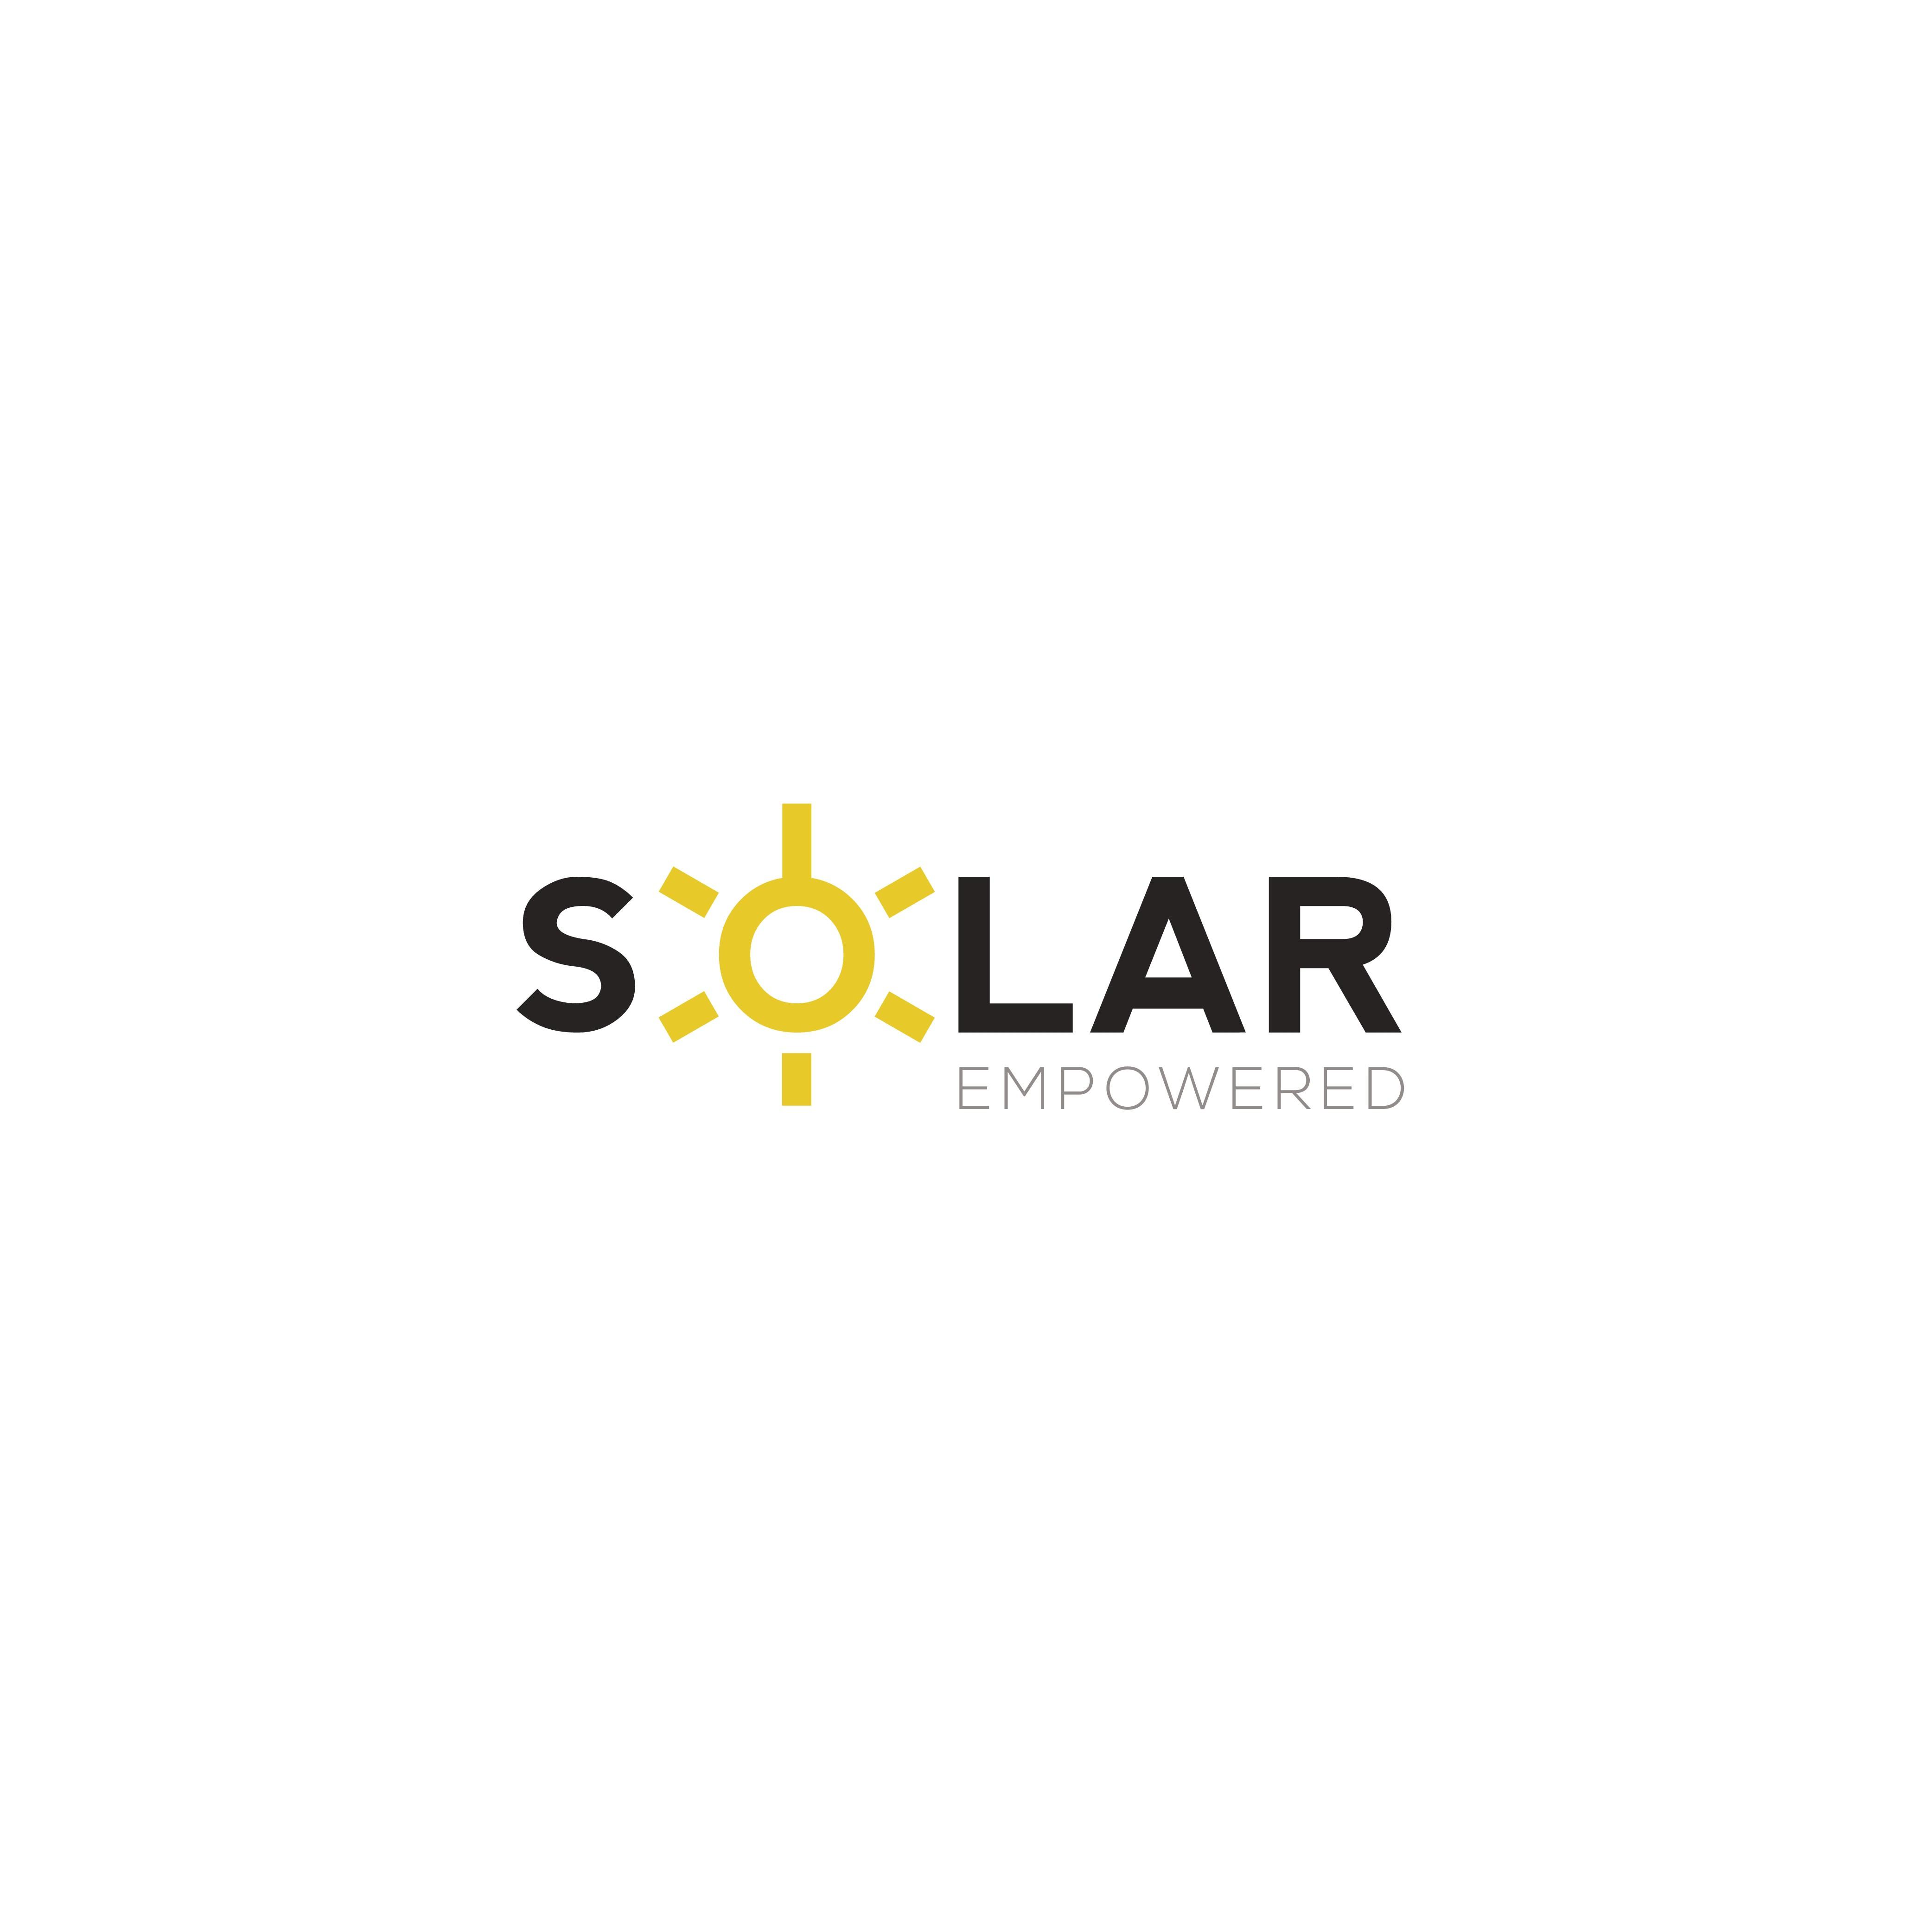 Simple logo design for a Solar Energy Company